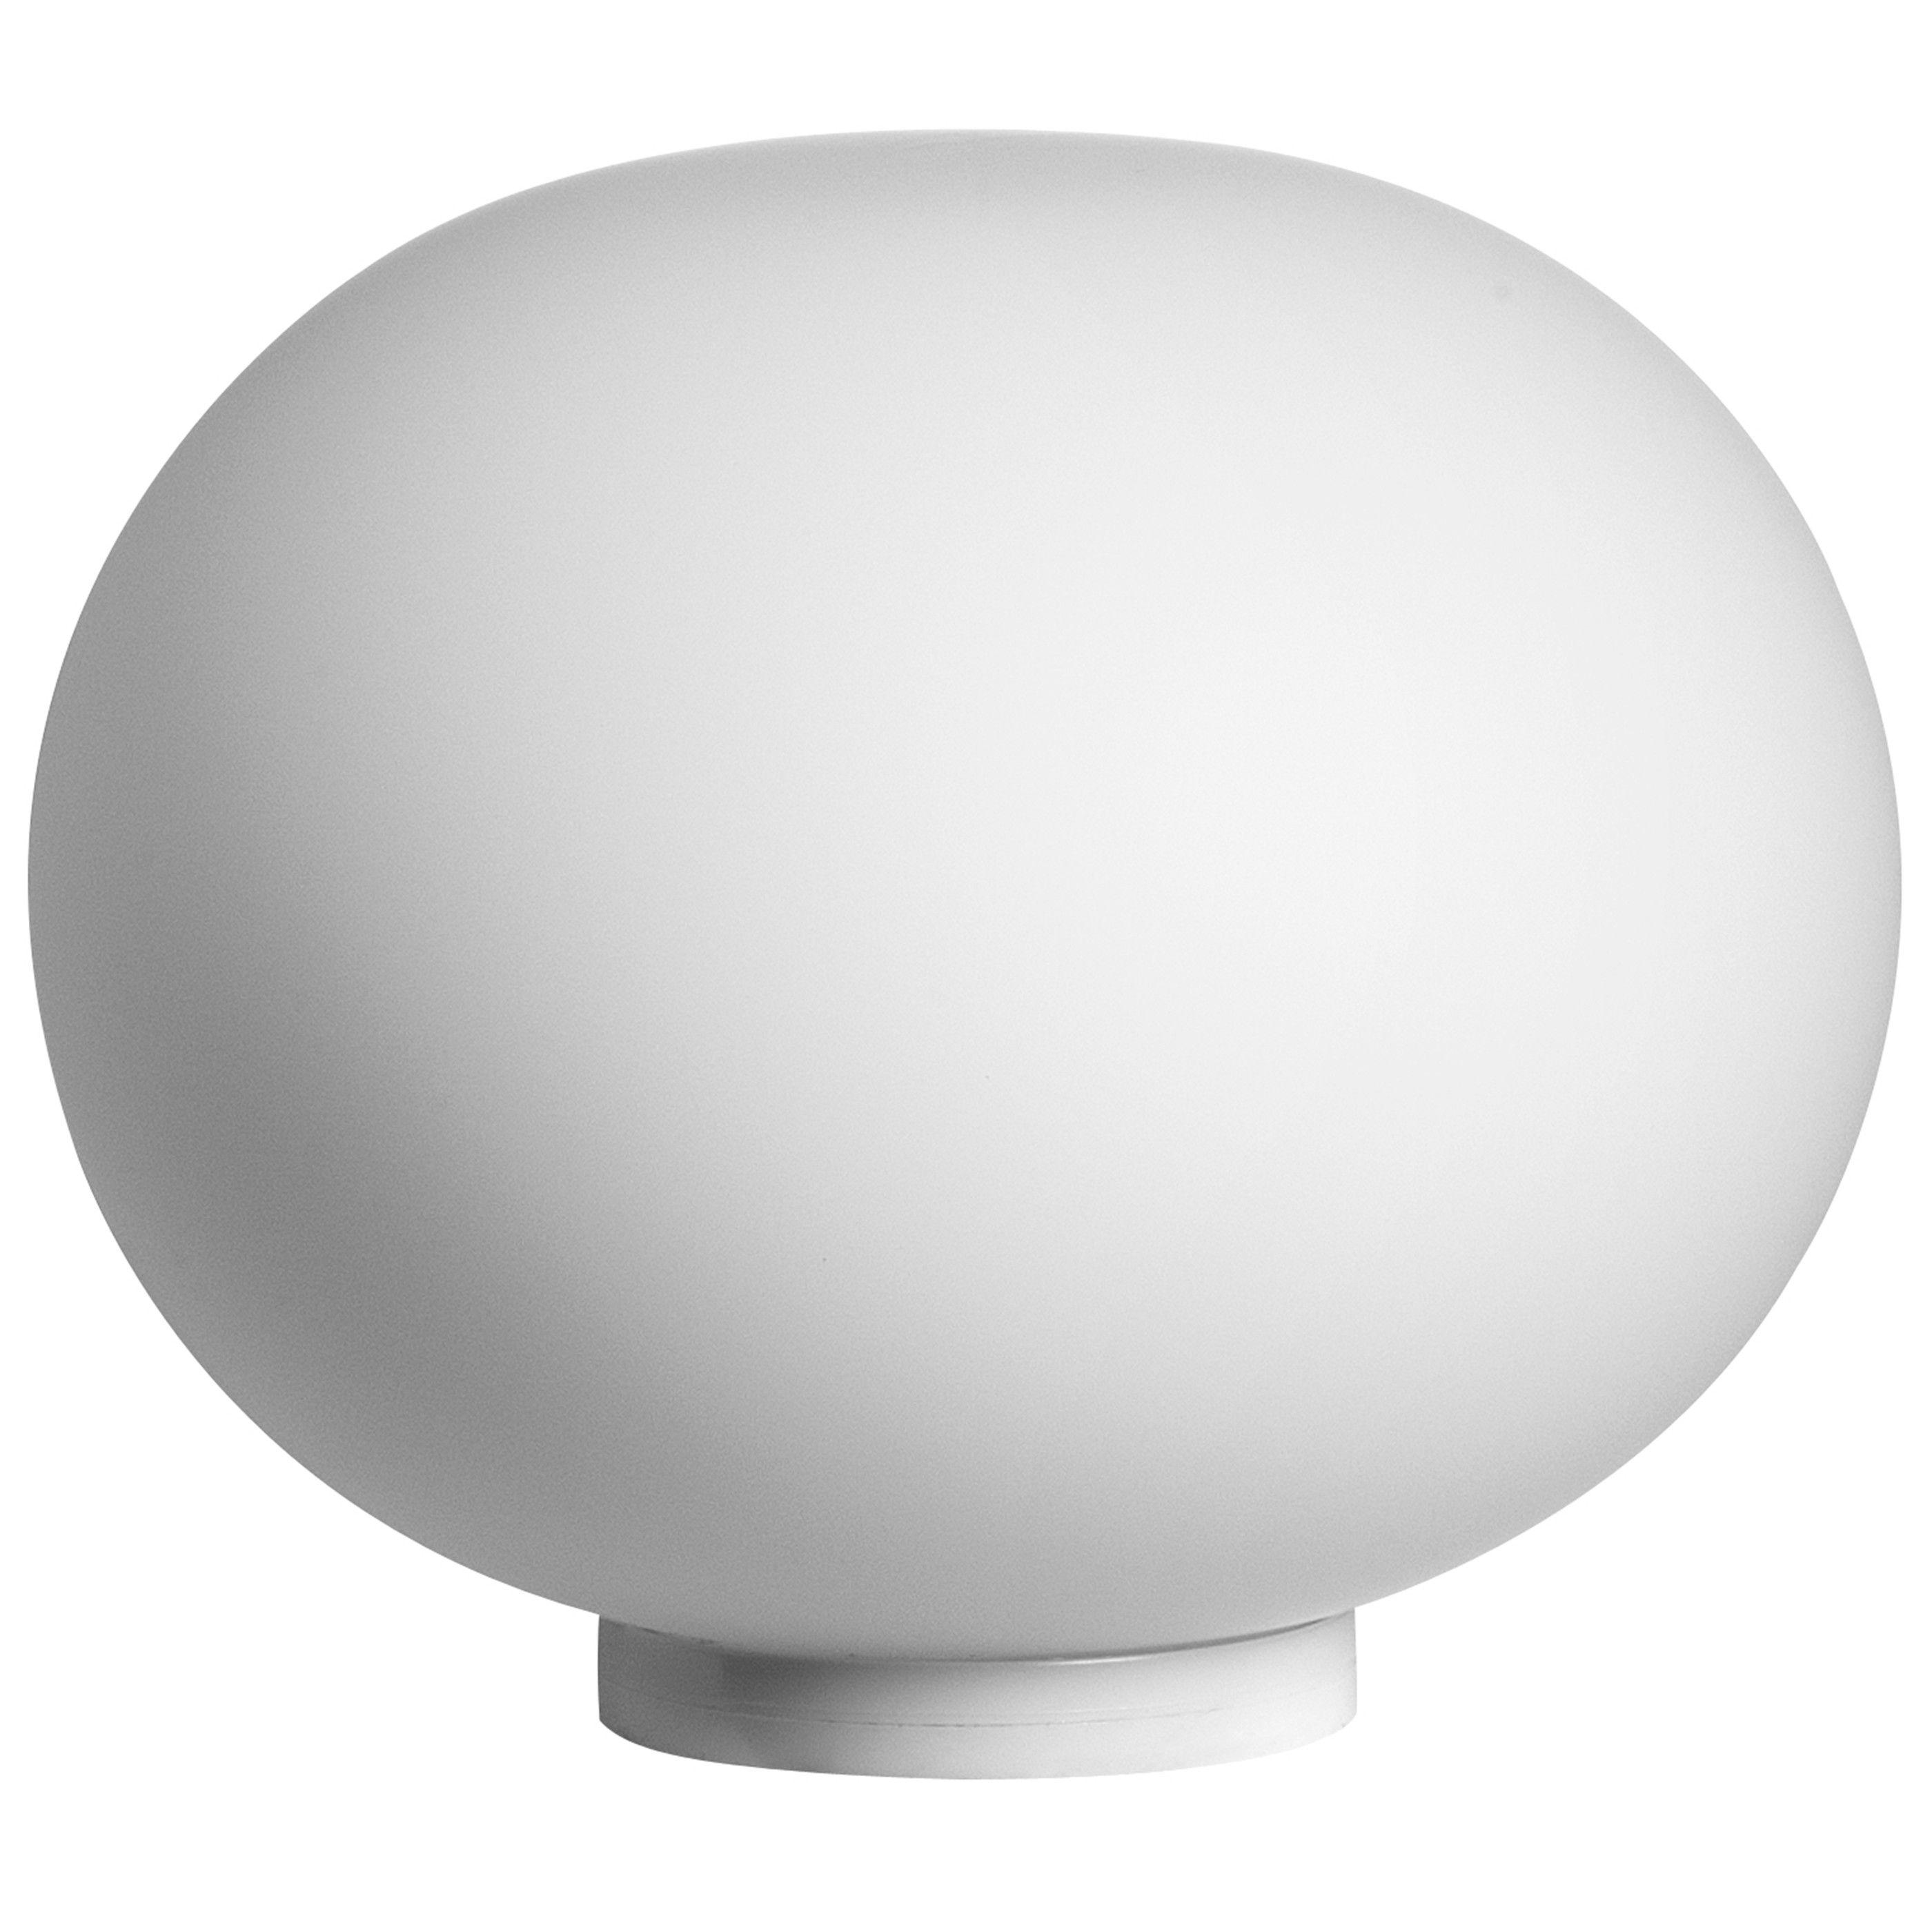 58f083ab4e397d3565ab7d7a44886b22 Elegantes Flos Glo Ball S Dekorationen